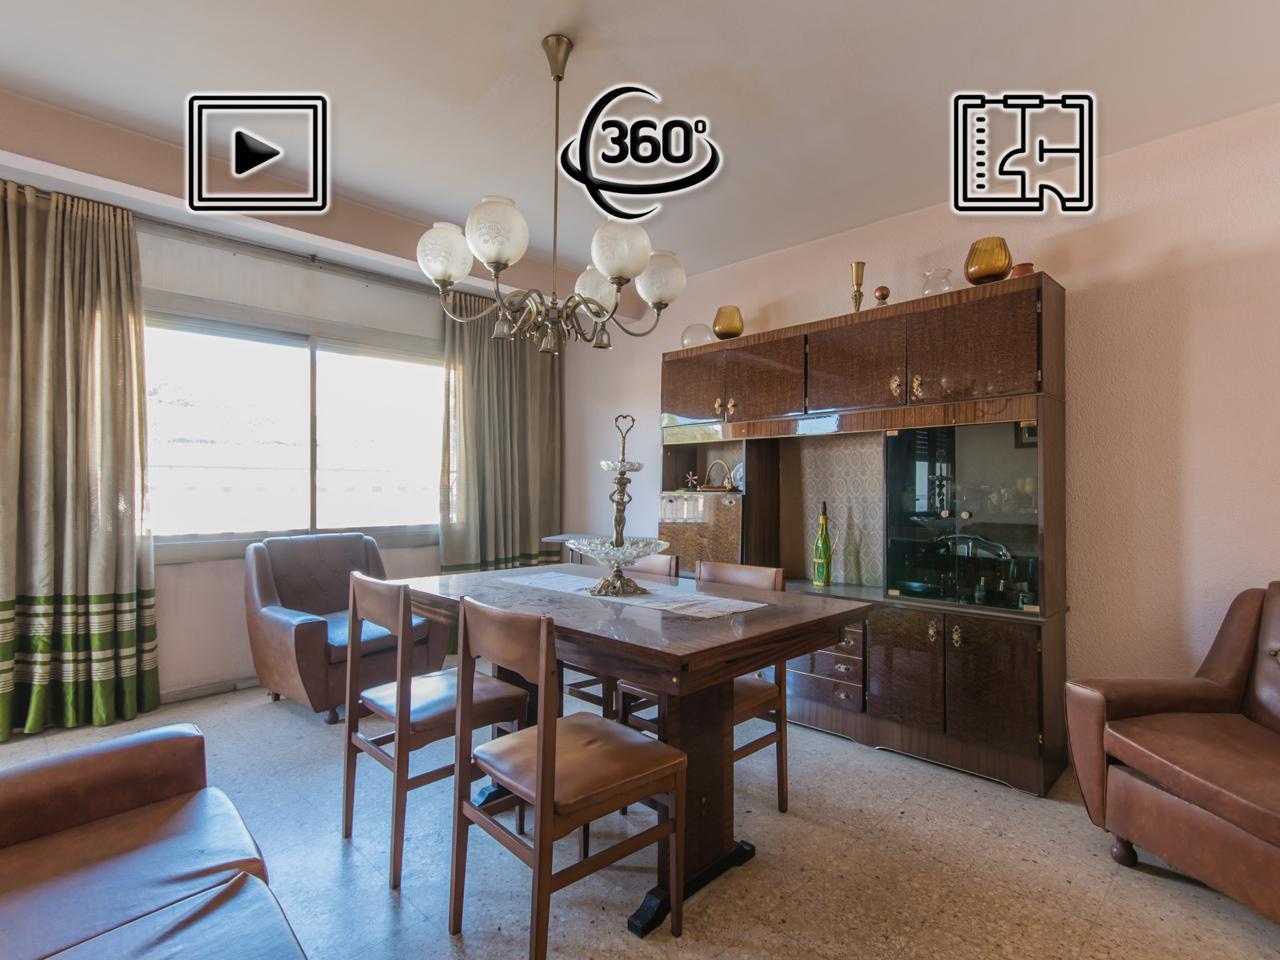 piso en montmelo · carrer-federico-garcia-lorca-08160 109000€